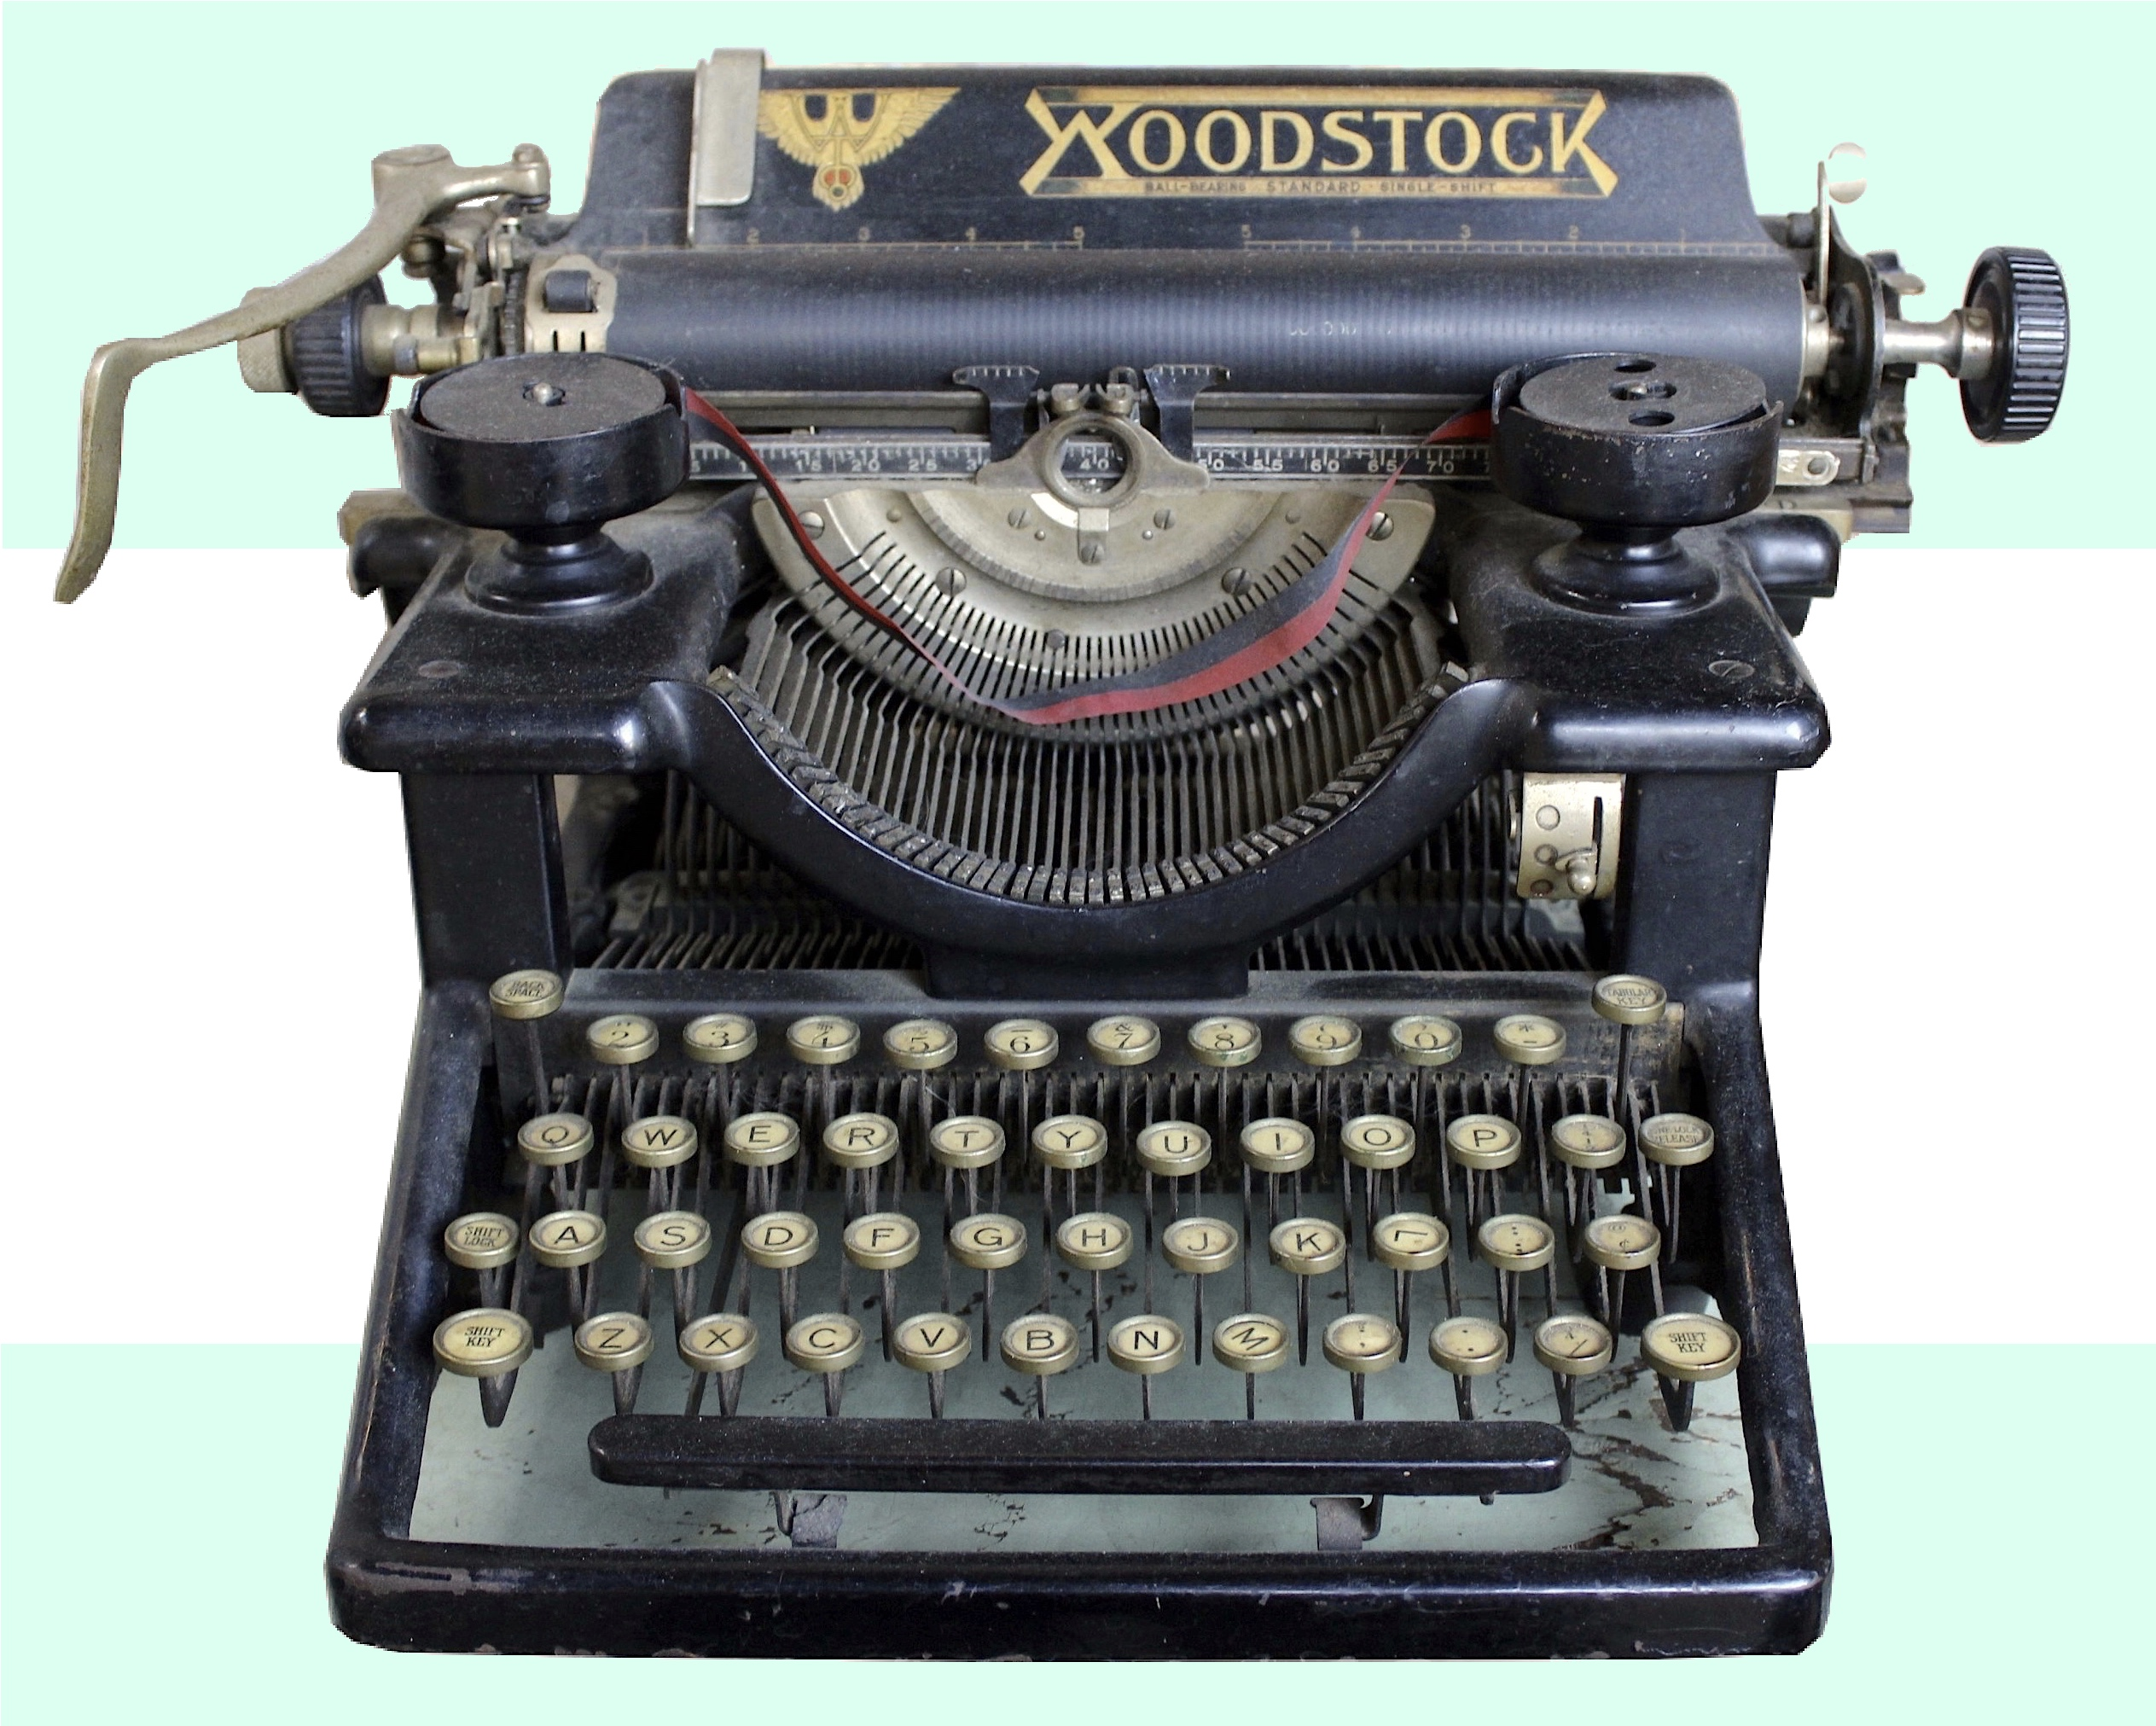 Woodstock Typewriter history